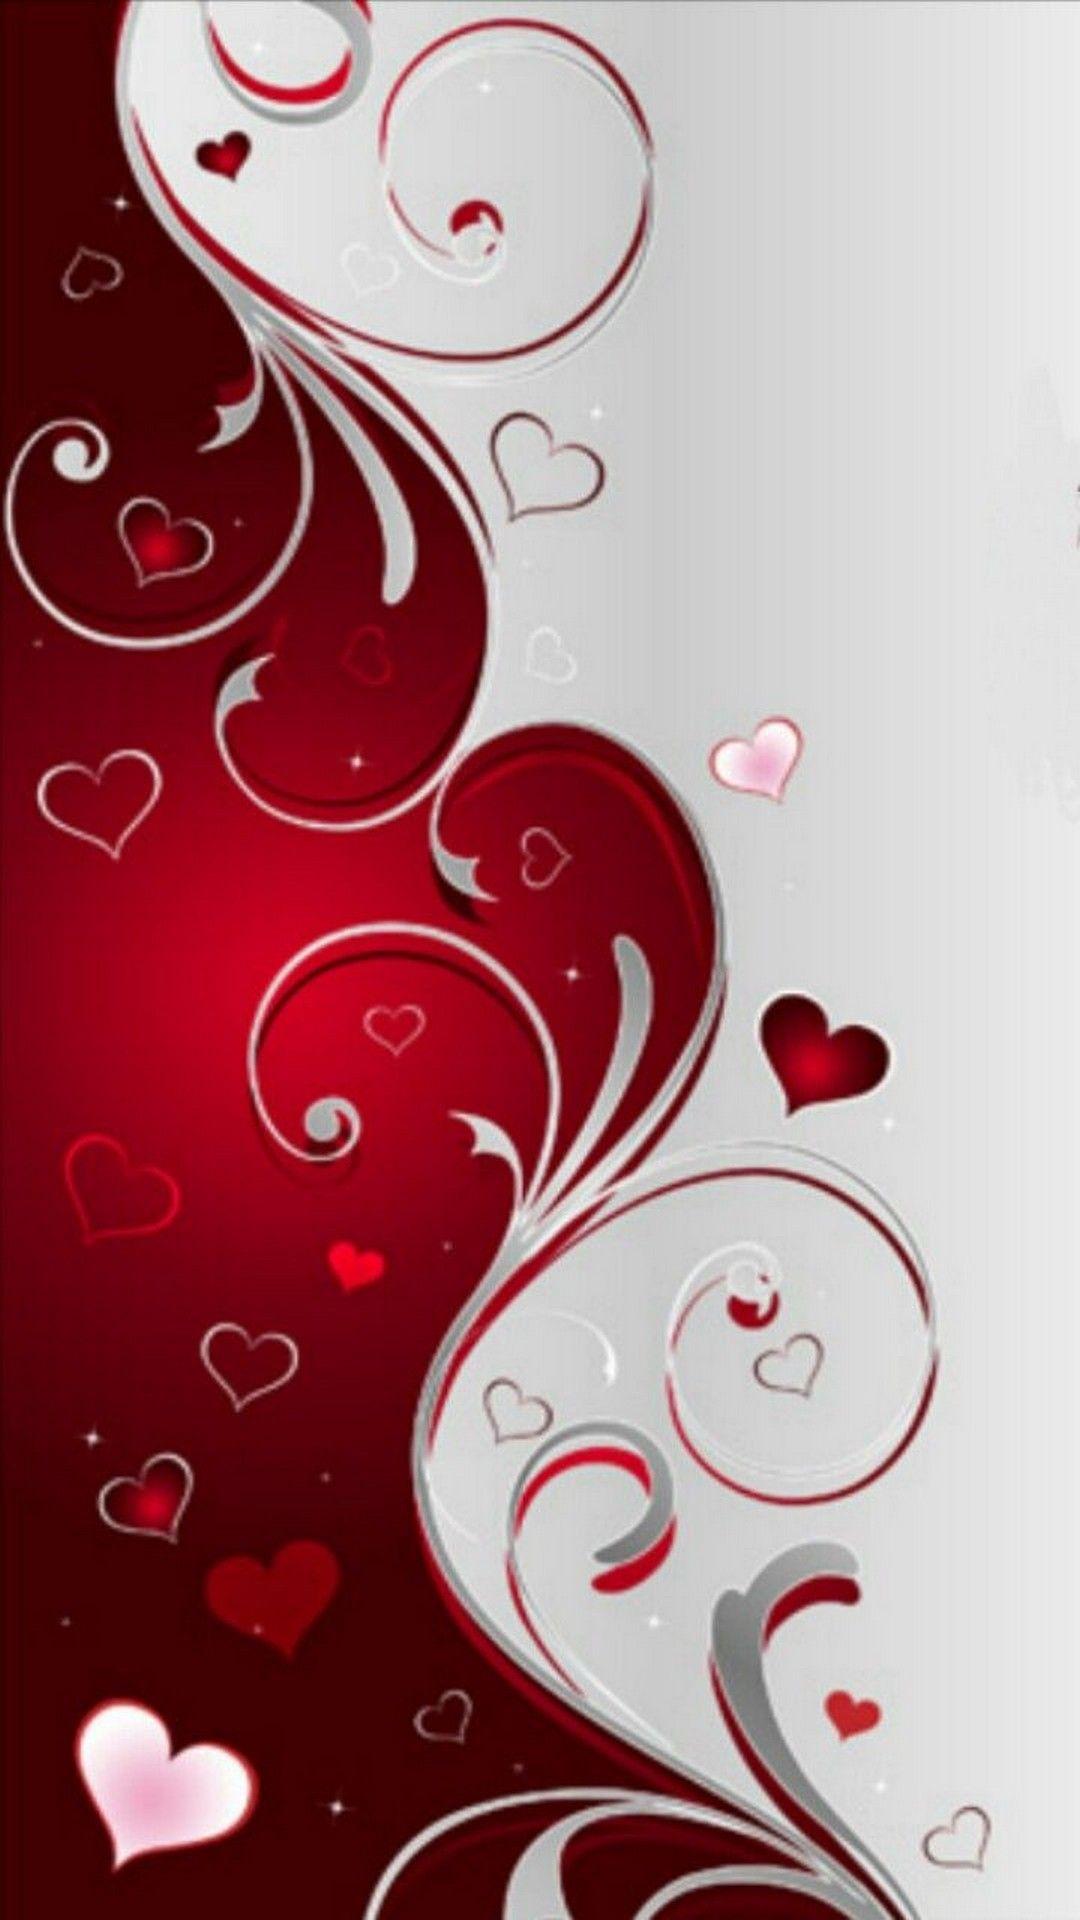 Valentine 8217 S Day Iphone Wallpaper Gallery Best Iphone Wallpaper Valentines Wallpaper Valentines Wallpaper Iphone Valentine Wallpaper Hd